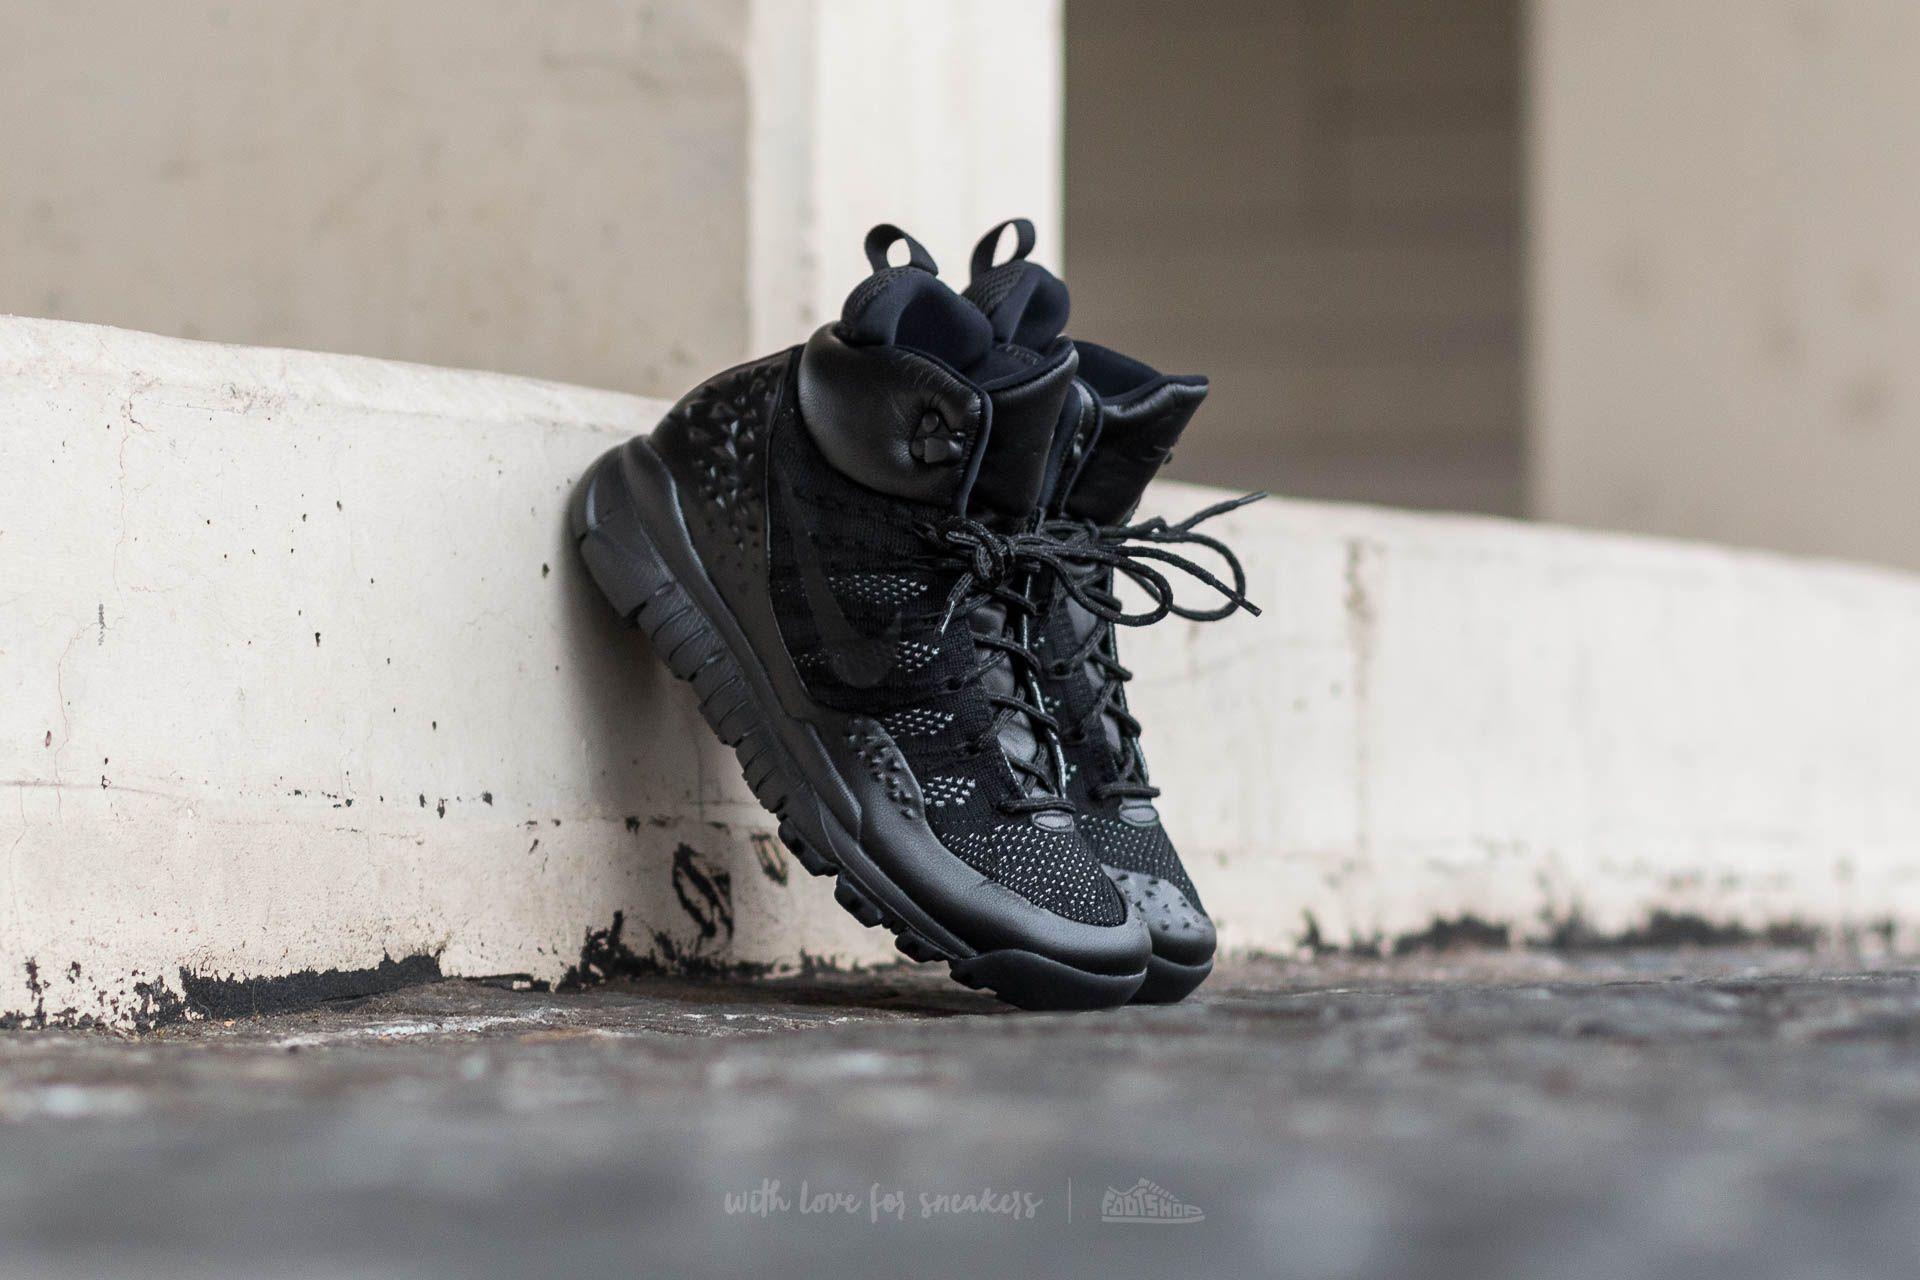 on sale 8e064 1aeb8 Nike Wmns Lupinek Flyknit. Black  Black-Anthracite